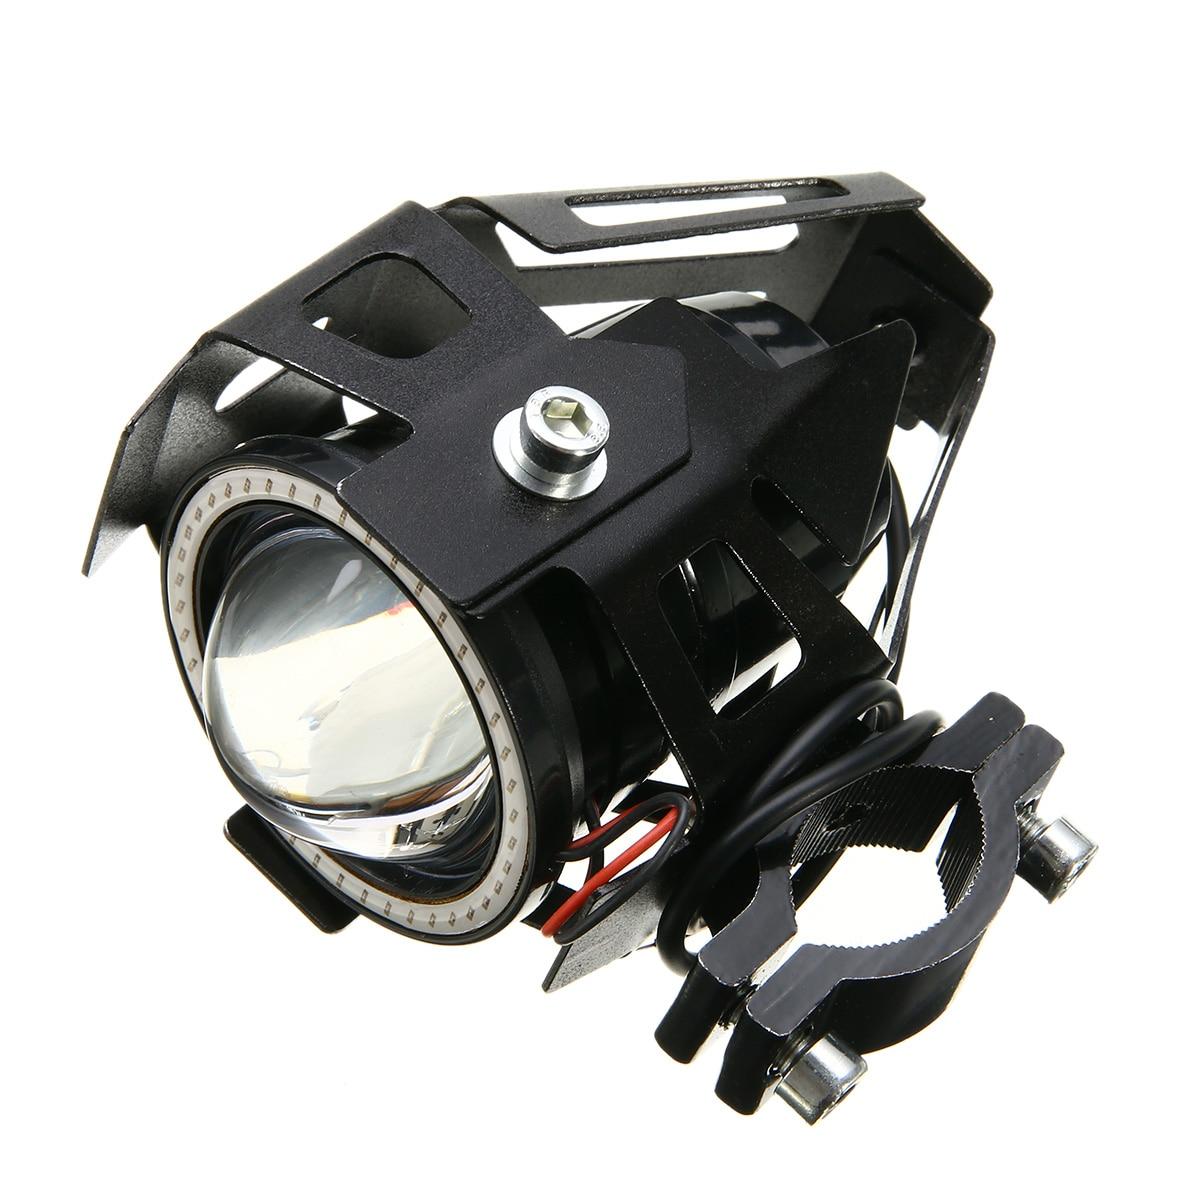 2 pcs 125 W U7 Moto LED Ange Yeux Phare Brouillard Spot Light + Commutateur des Phares Moto Moto Head Light lampe